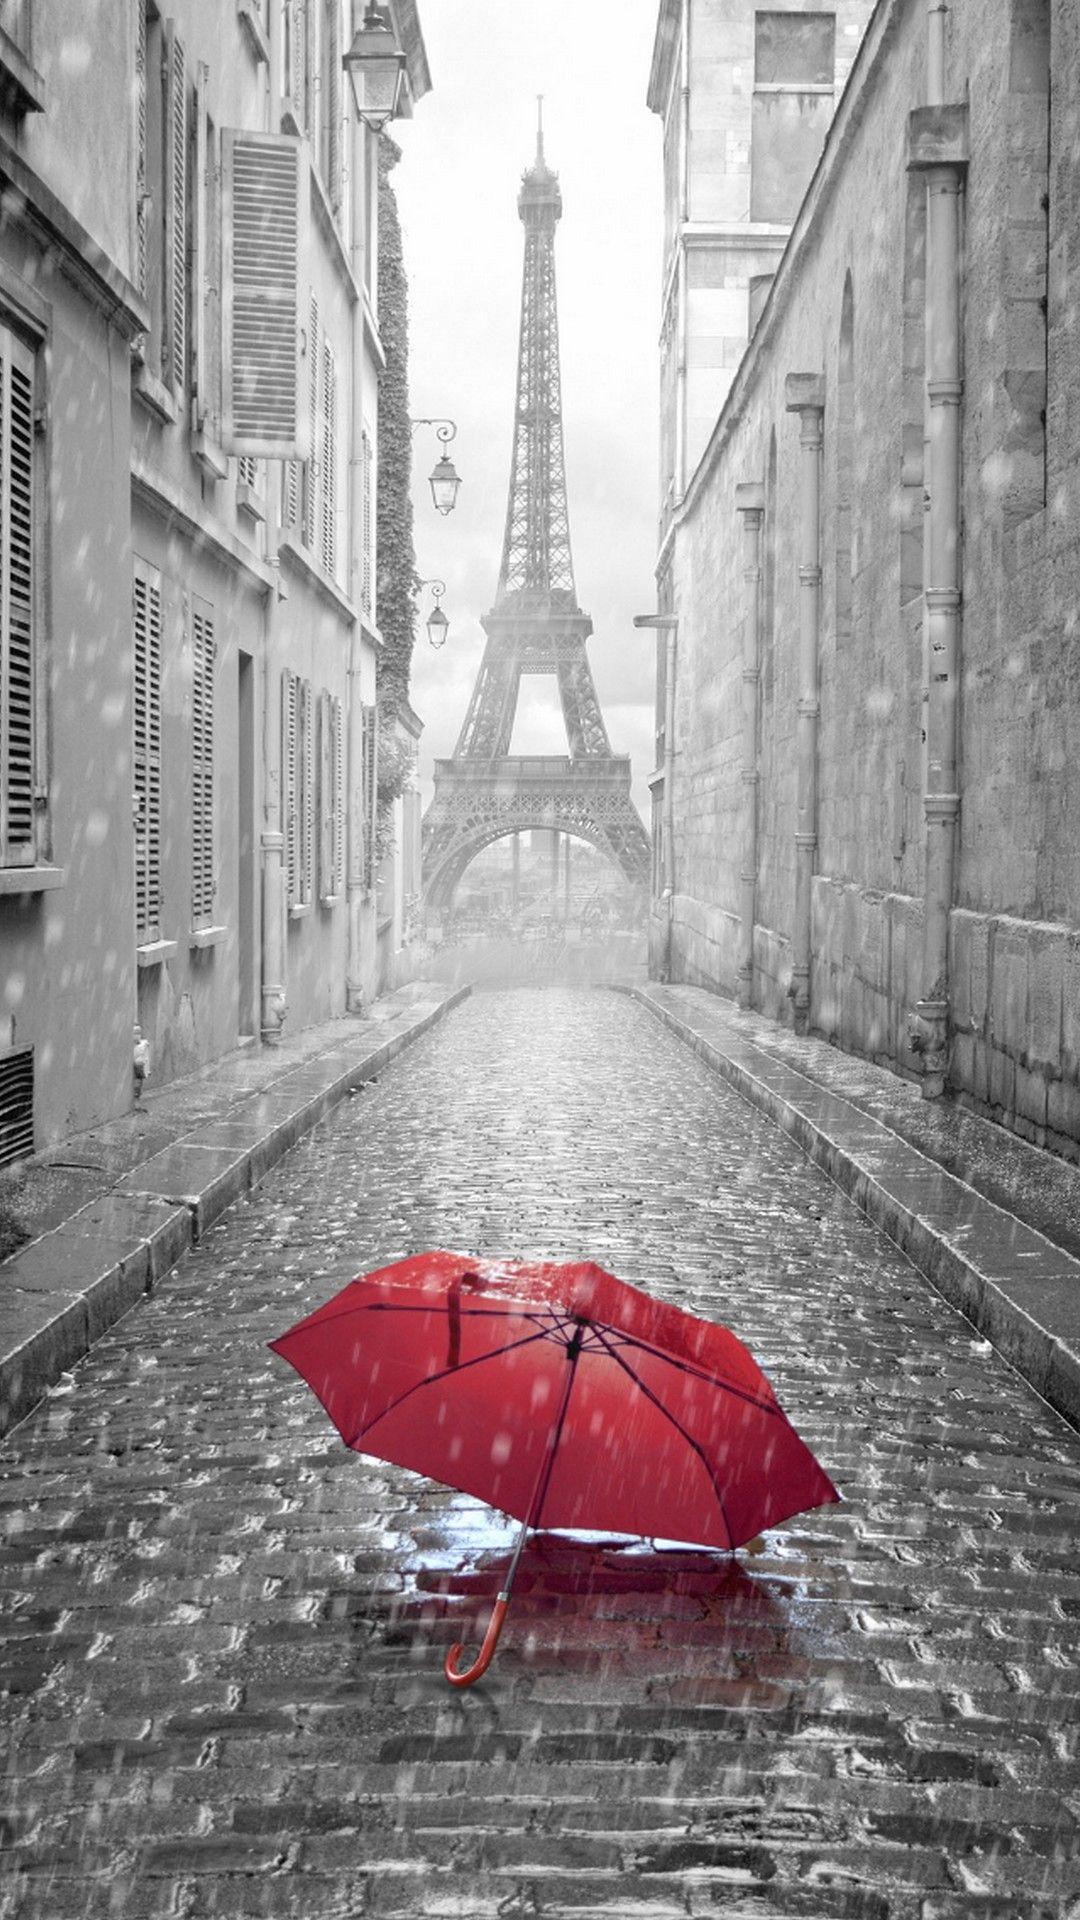 paris france rain eiffel tower iphone wallpaper iphonewallpapers pinterest paris. Black Bedroom Furniture Sets. Home Design Ideas